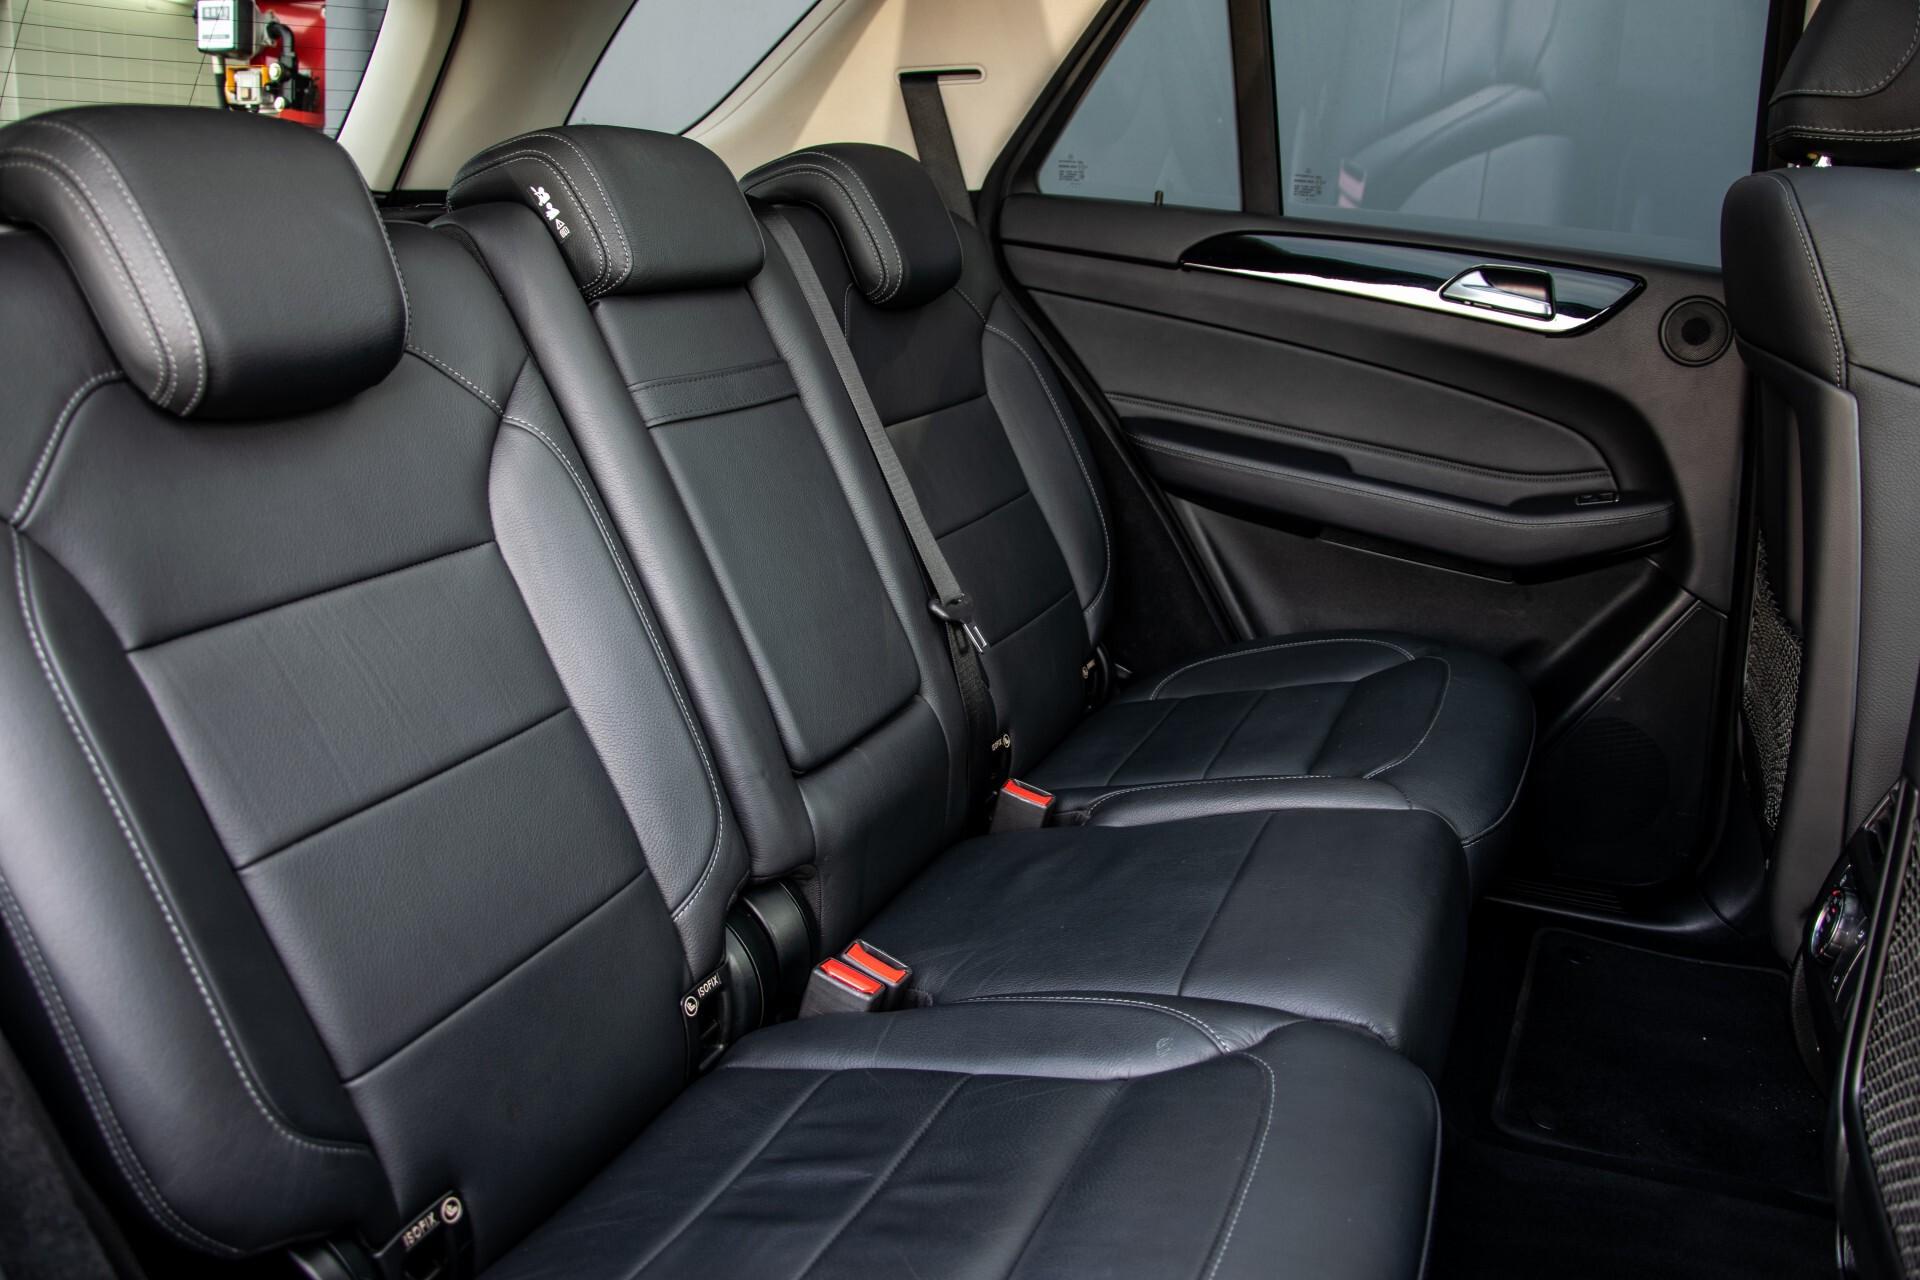 Mercedes-Benz GLE 350 d 4-M AMG Active Curve System/Panorama/Standkachel/Harman-Kardon/Trekhaak Aut9 Foto 4